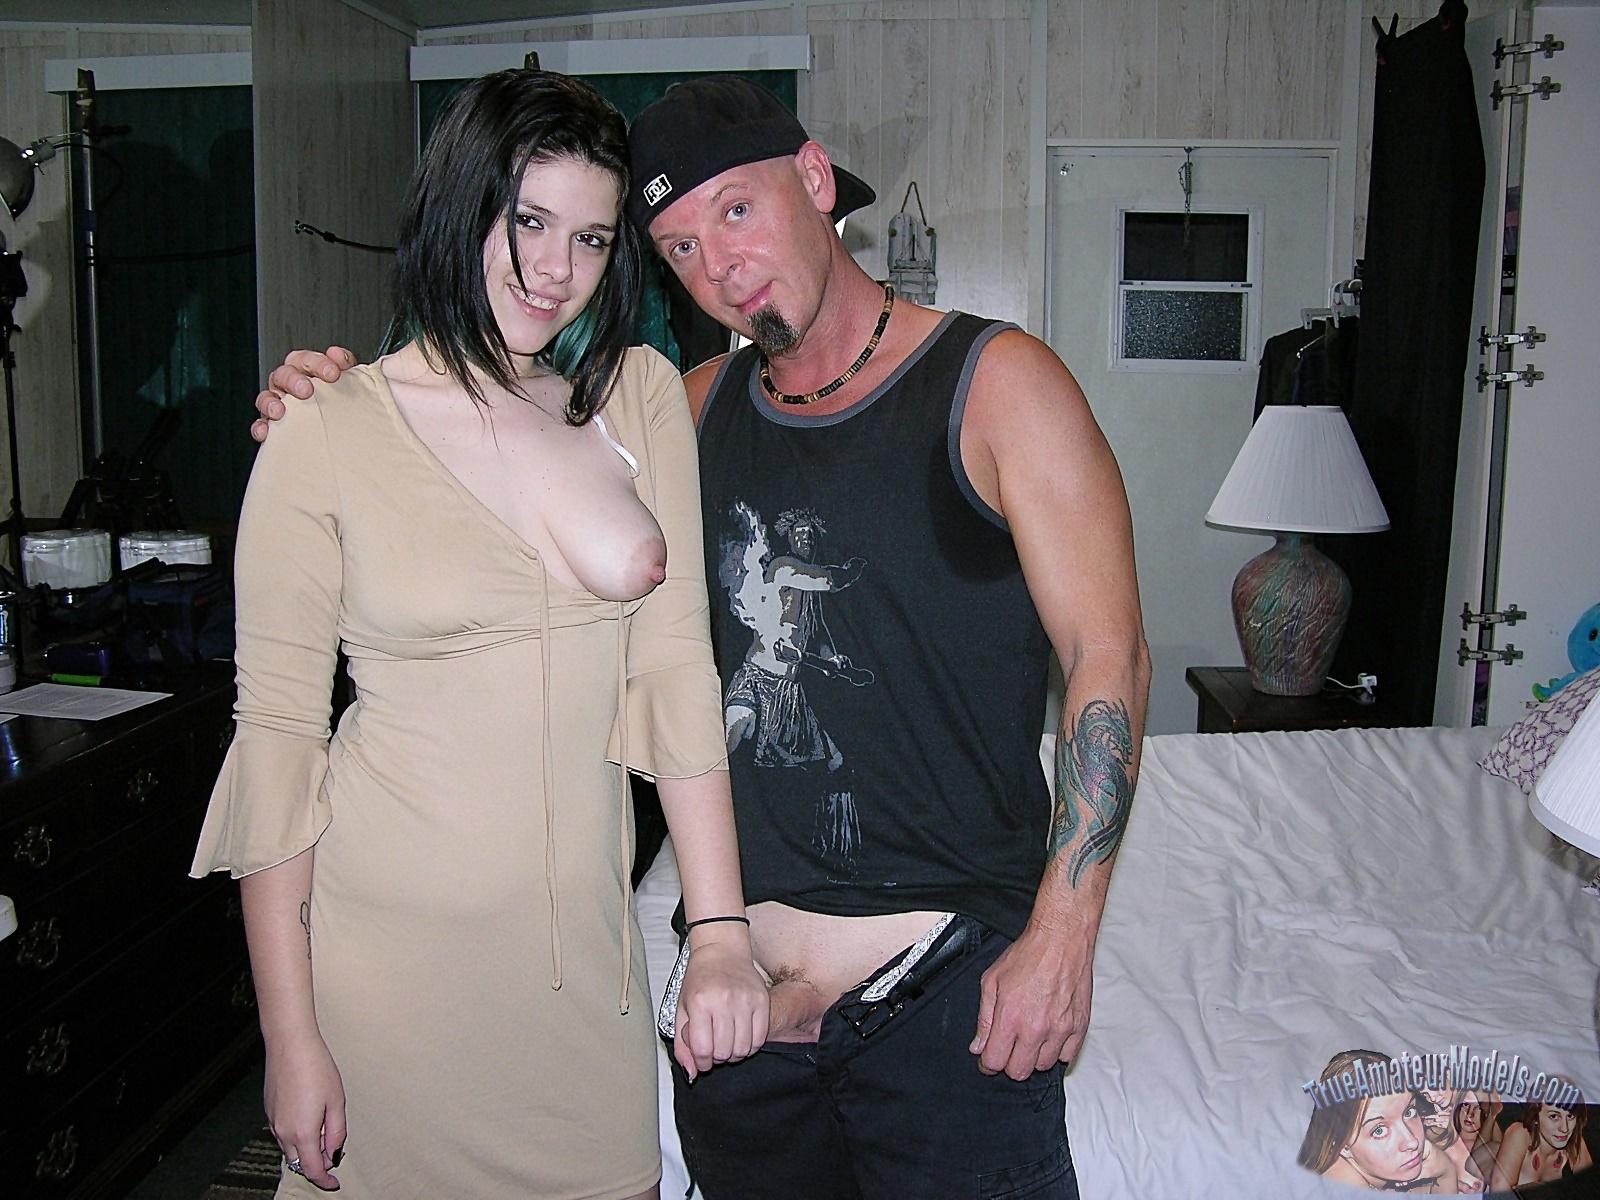 true-amateur-models-porn-shoot0ray-edwards